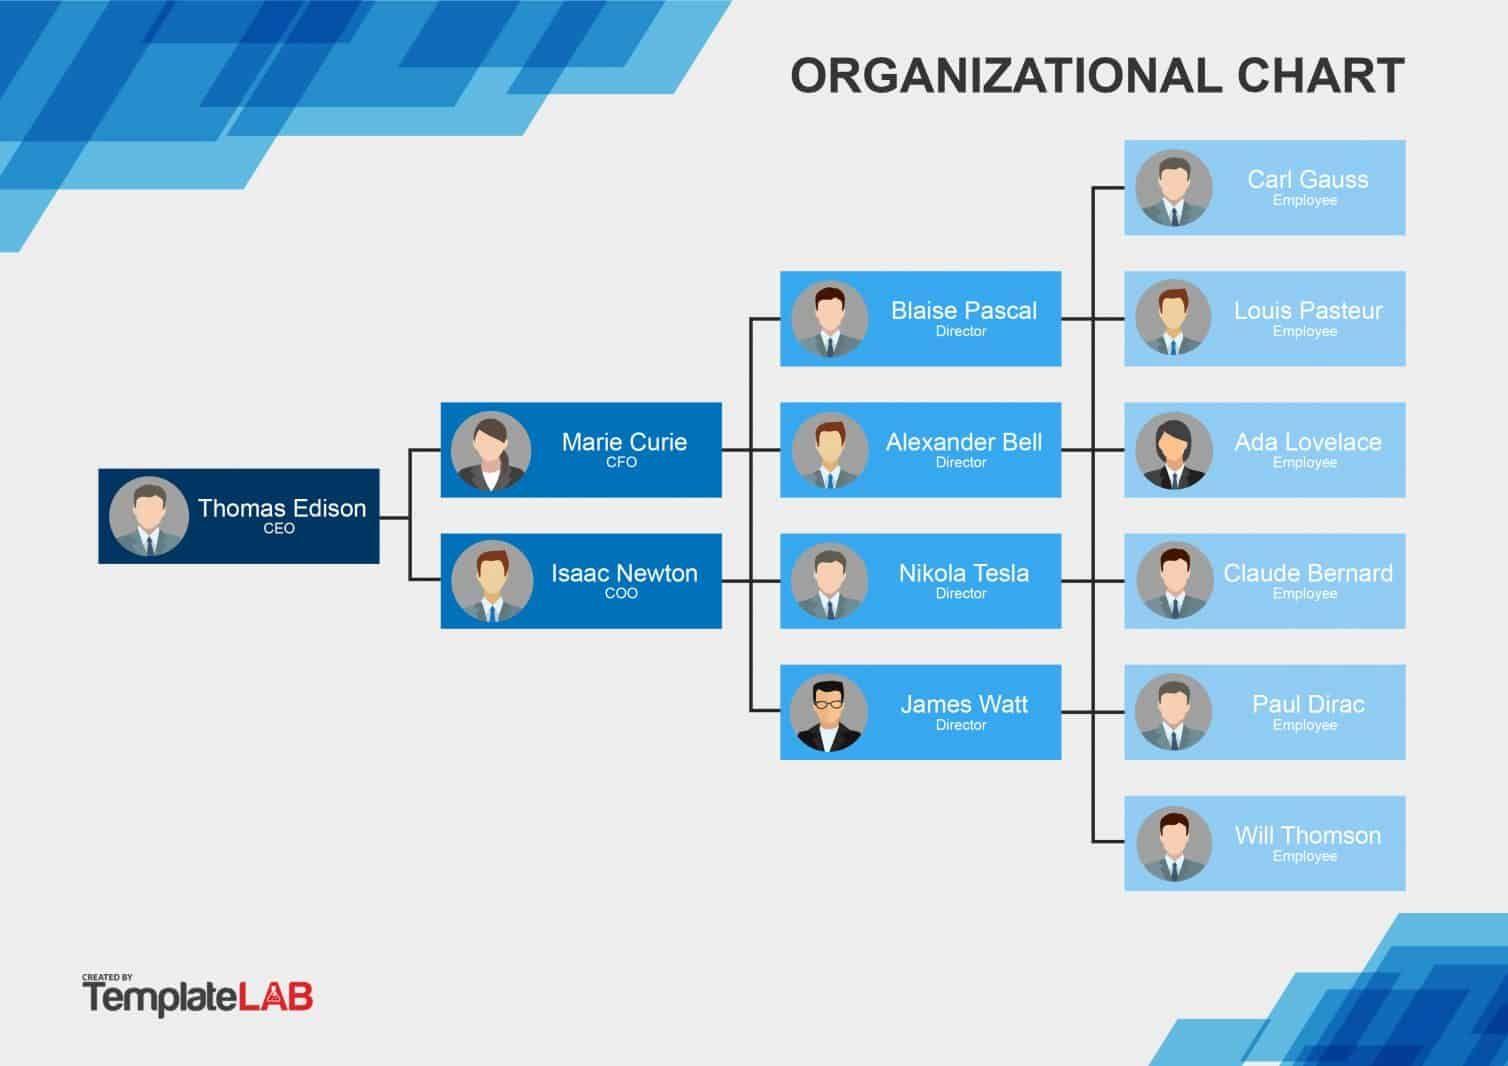 40 Organizational Chart Templates Word Excel Powerpoint In Microsoft Powerpoint Org Chart Template Samp Organizational Chart Org Chart Organization Chart